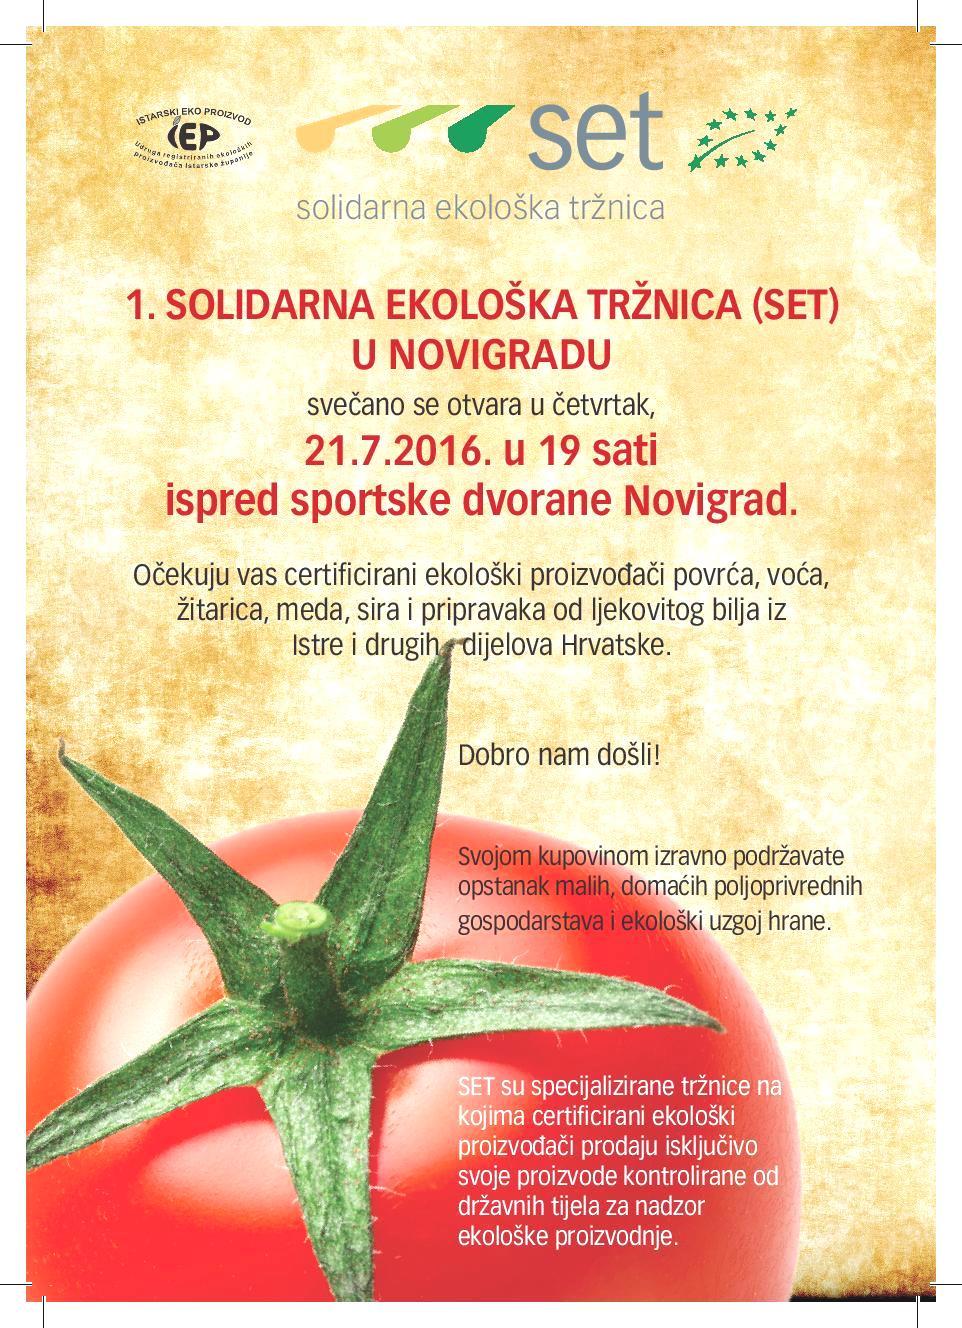 http://www.novigrad.hr/1._solidarna_ekoloshka_trzhnica_set_u_novigradu